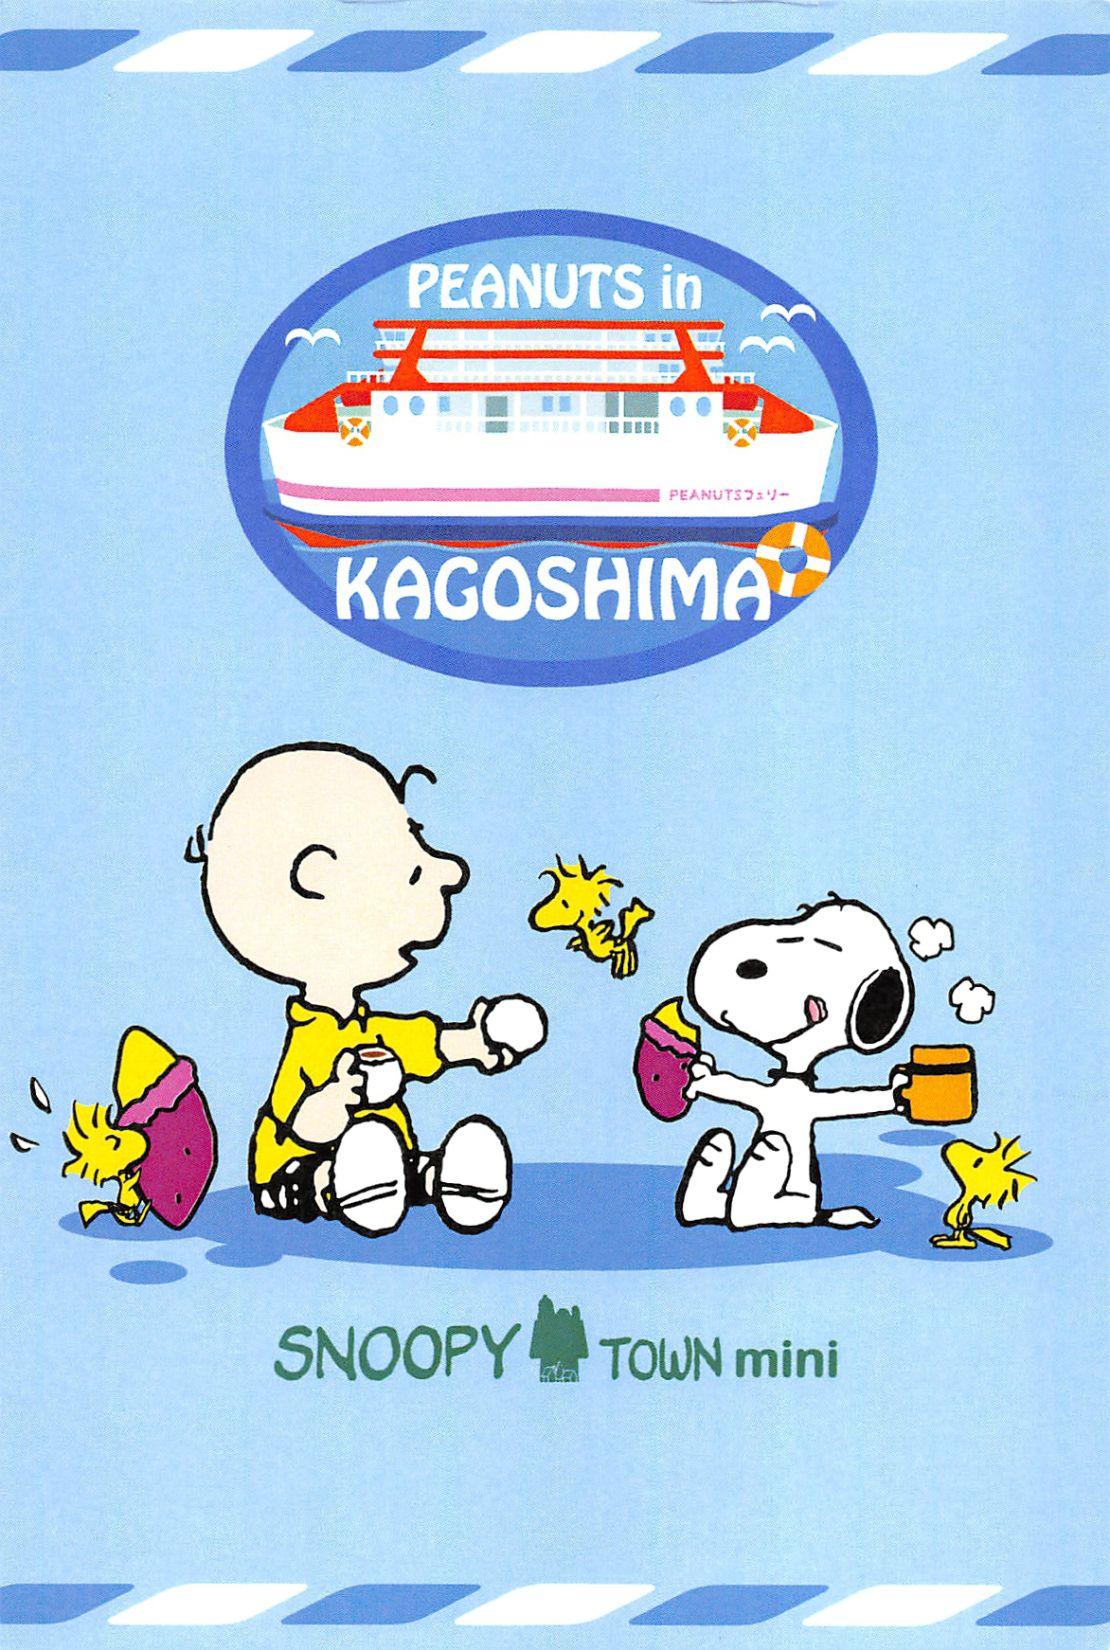 Japan Snoopy Town Kagoshima My Peanuts Gang And Snoopy Postcard Collection スヌーピー ビンテージ ポスター